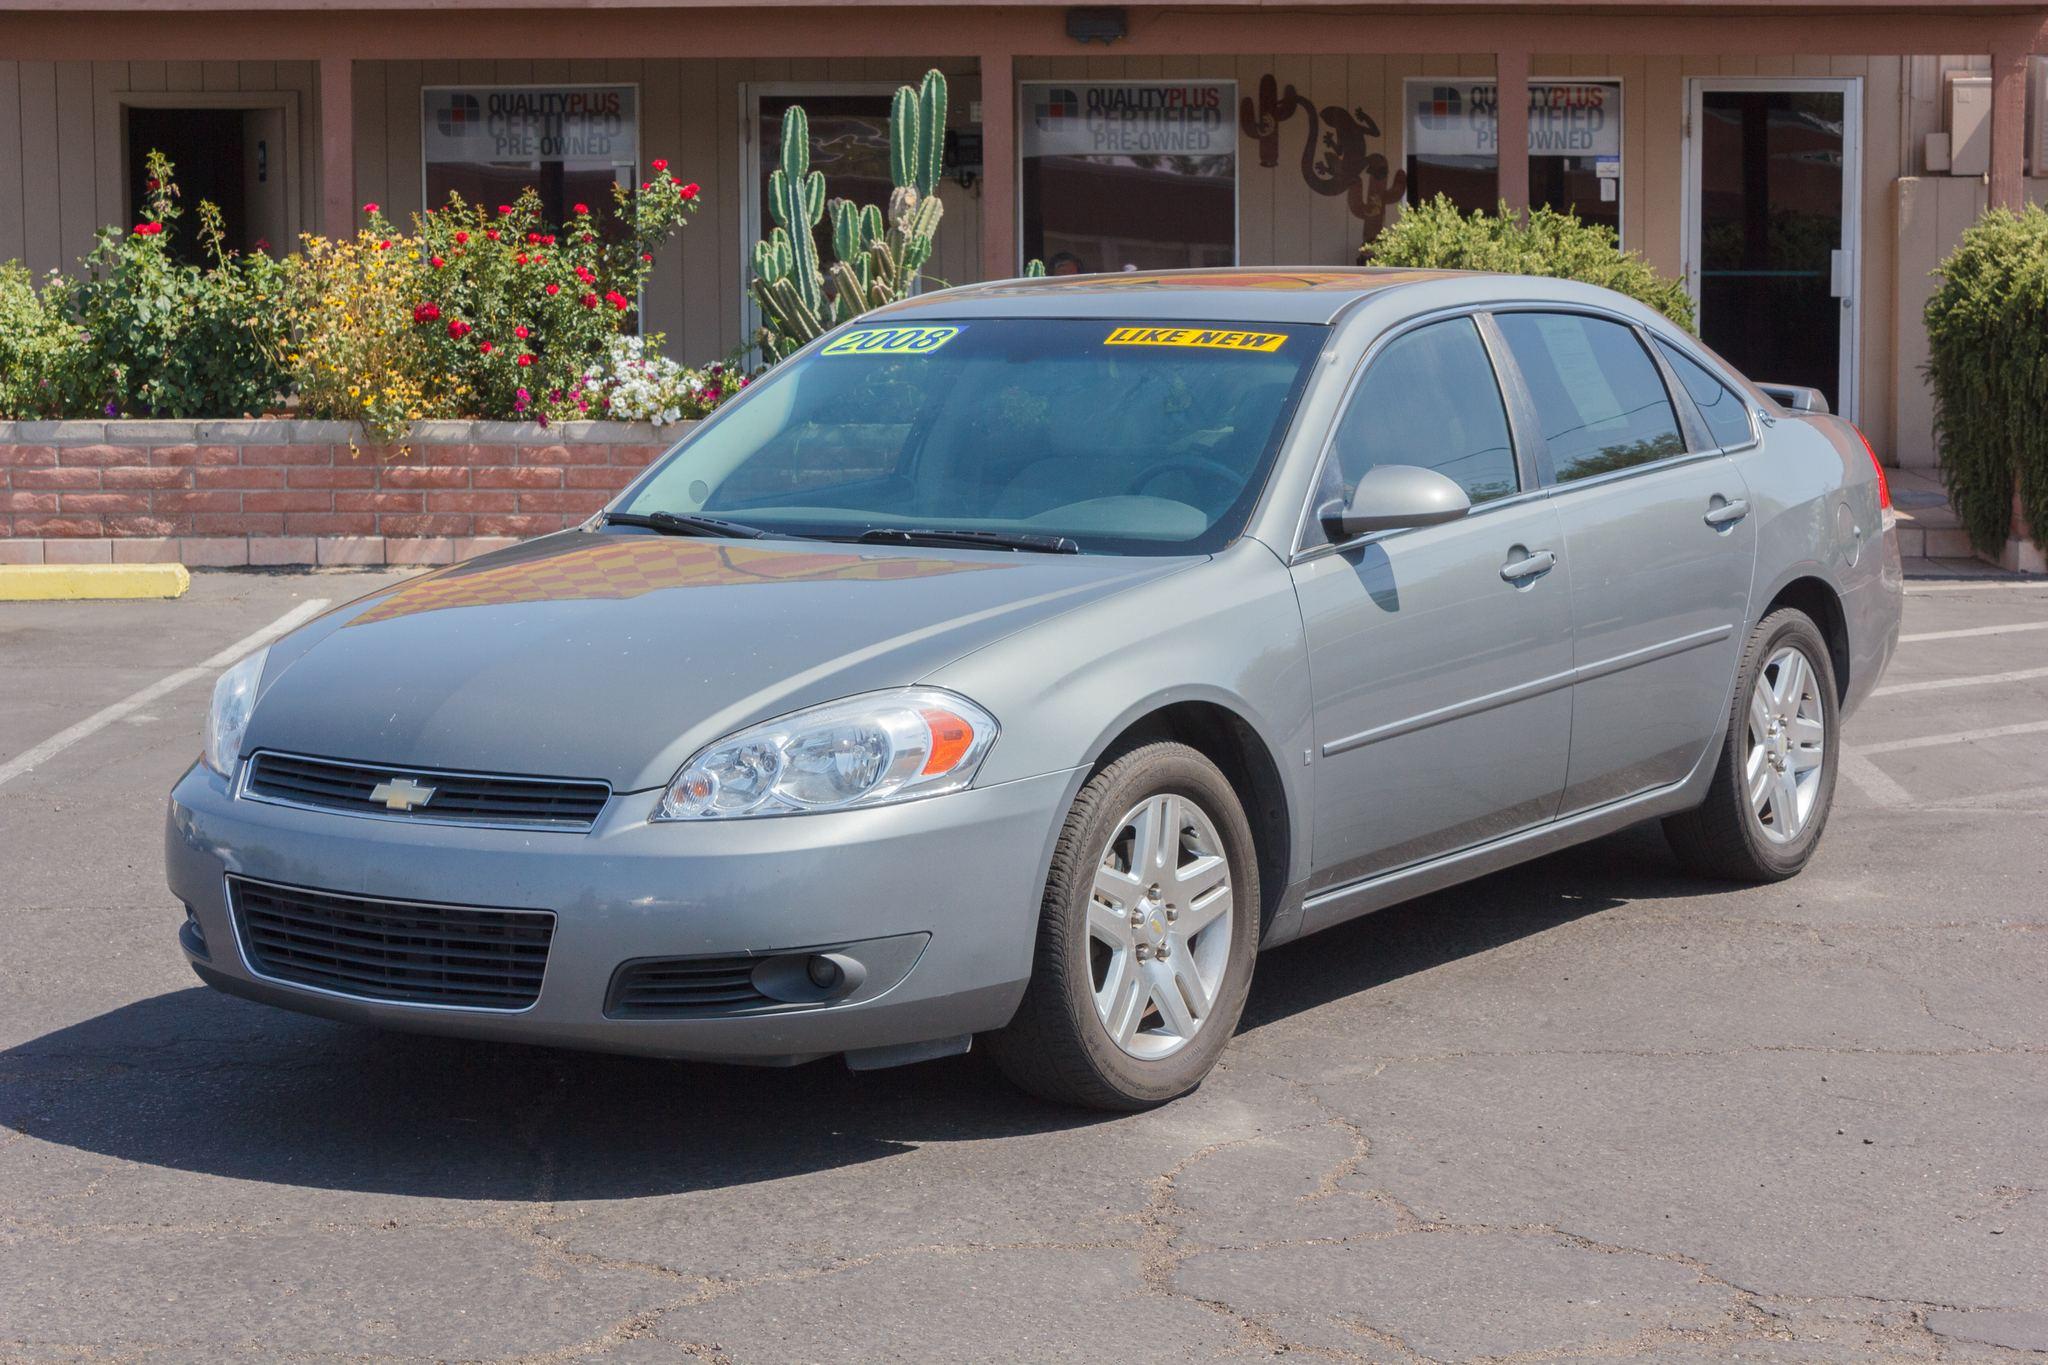 Photo of 2008 Chevrolet Impala 4d Sedan LT 3.9L Slate Metallic